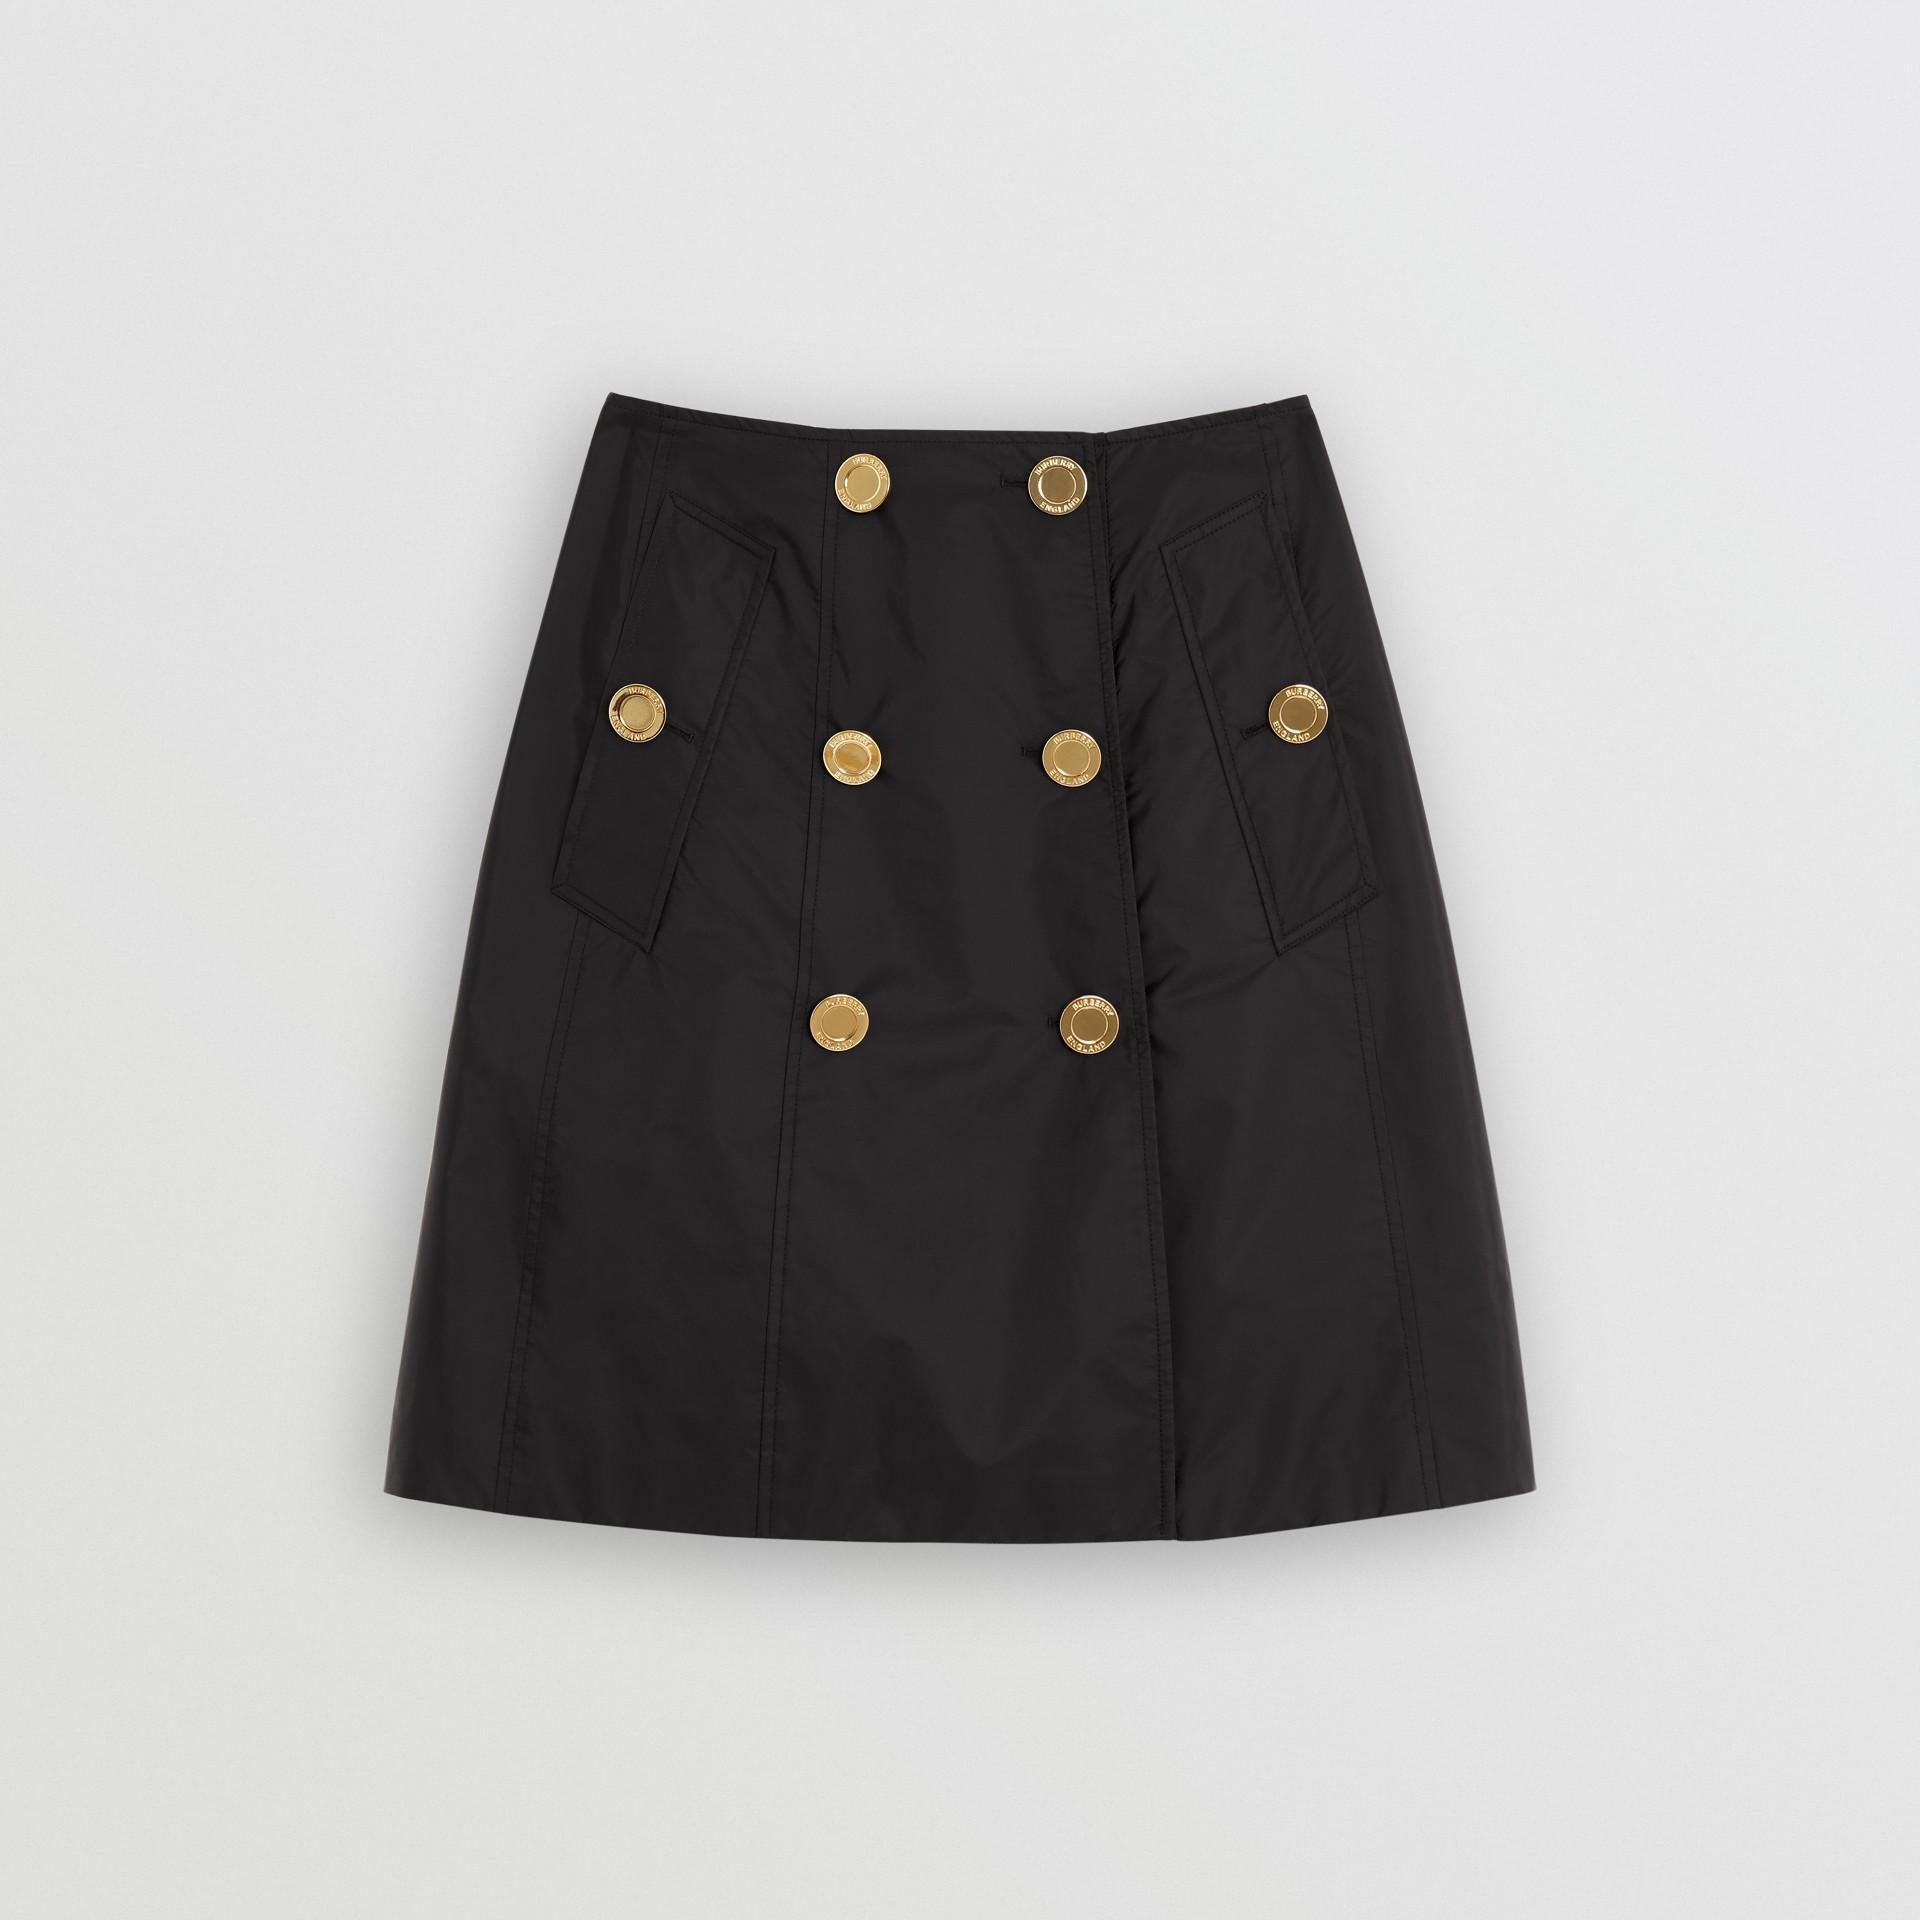 Nylon Trench Skirt in Black - Women | Burberry - gallery image 1